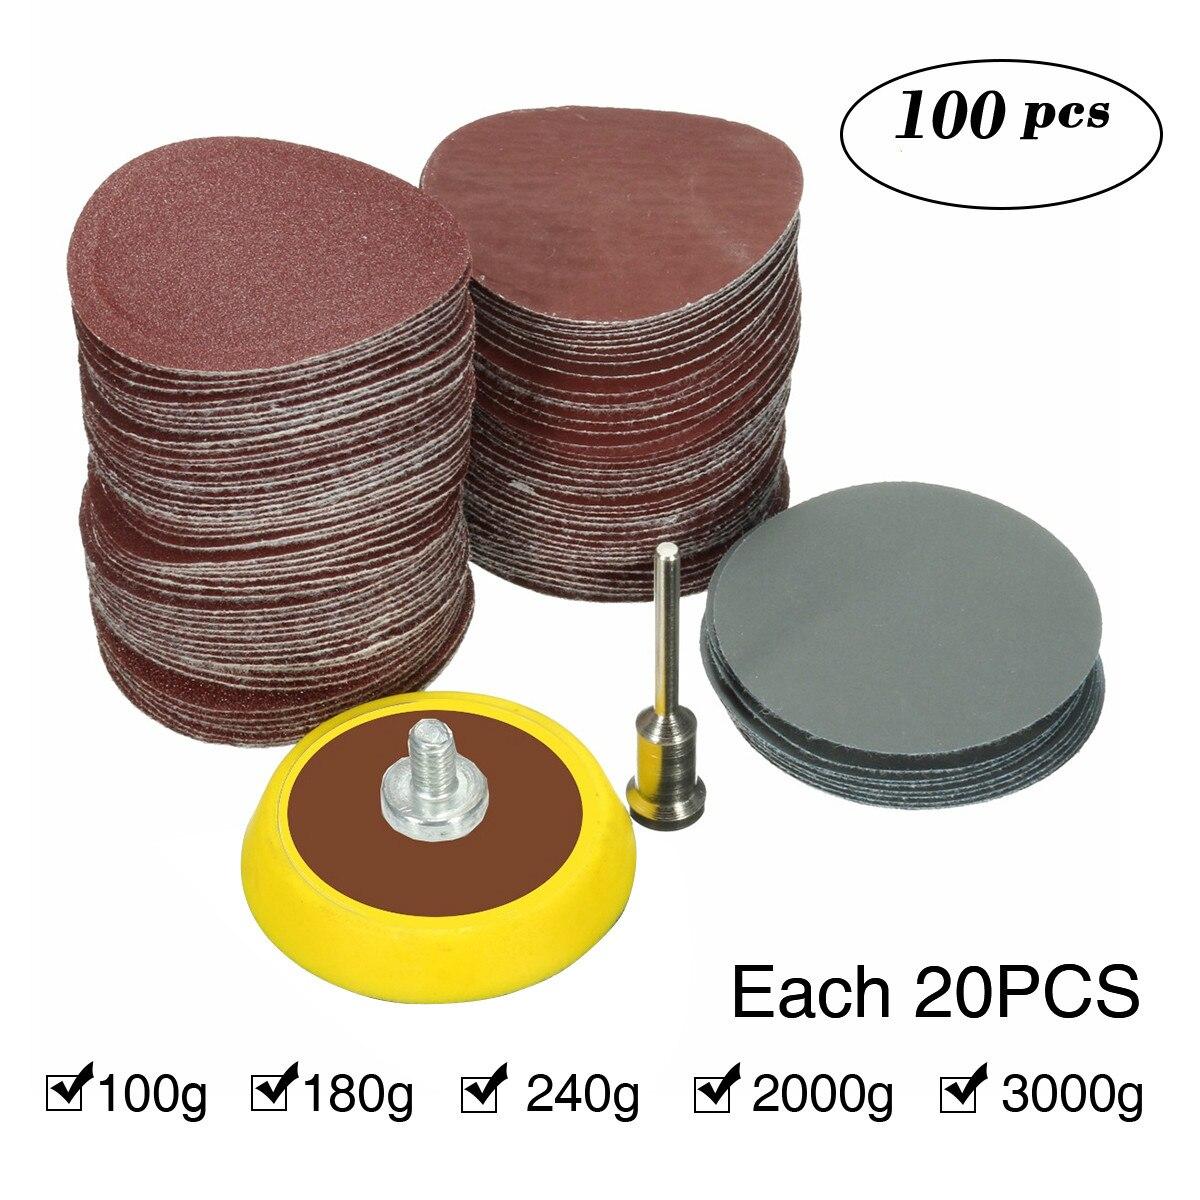 100pcs 25mm/1inch Sandpaper  + 1pcs Loop Sanding Pad Abrasives Mixed Polishing + 1pcs 1inch Hook Loop Backer Plate 1/8inch Shank